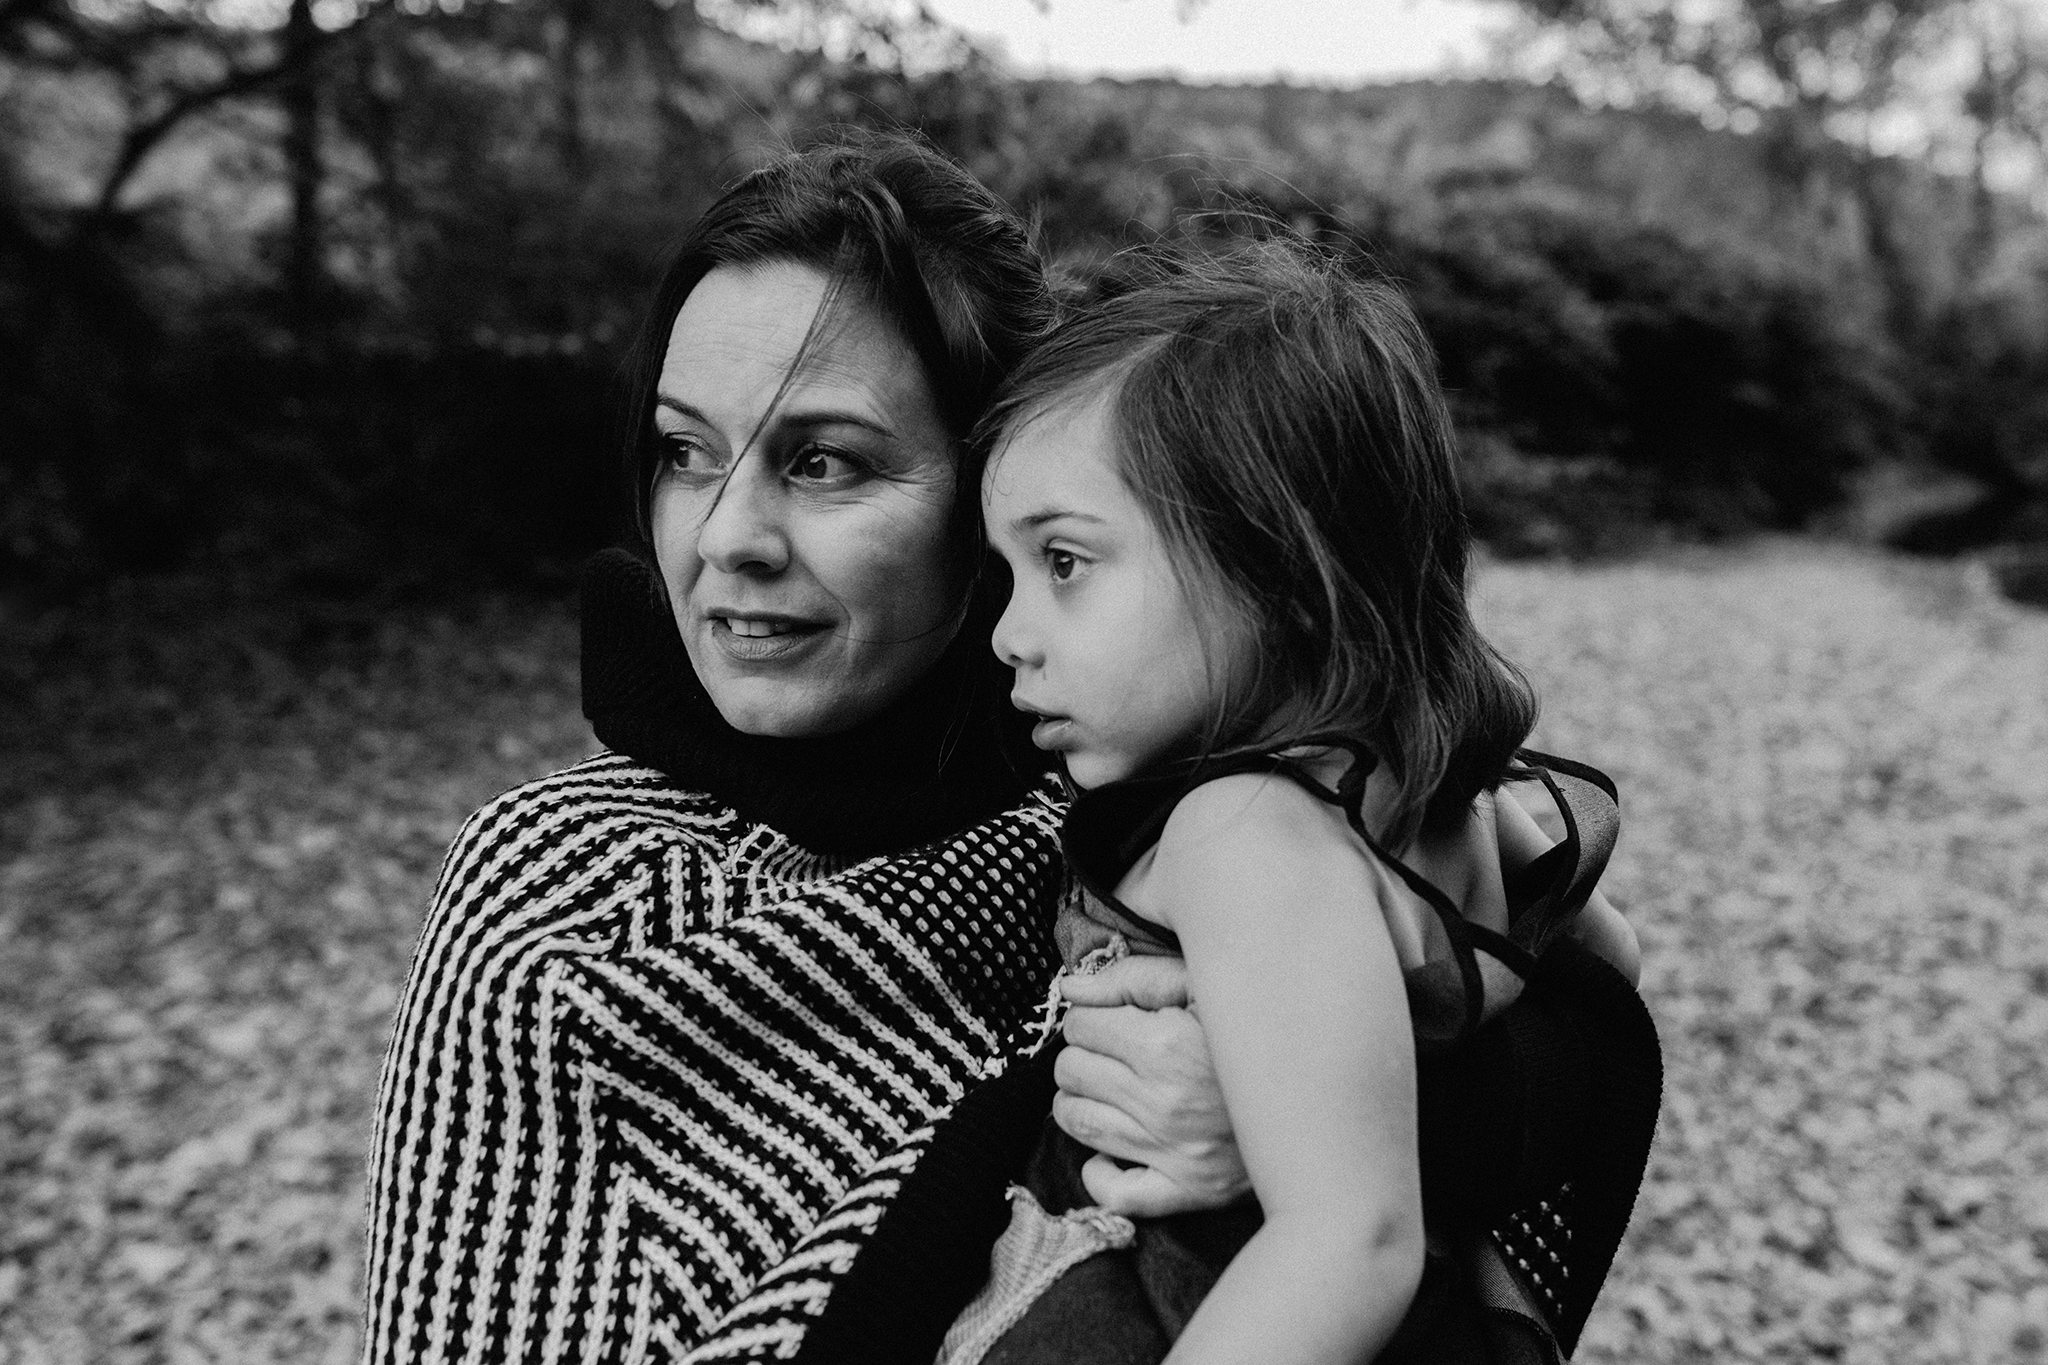 vermont fall family portraits-40.jpg